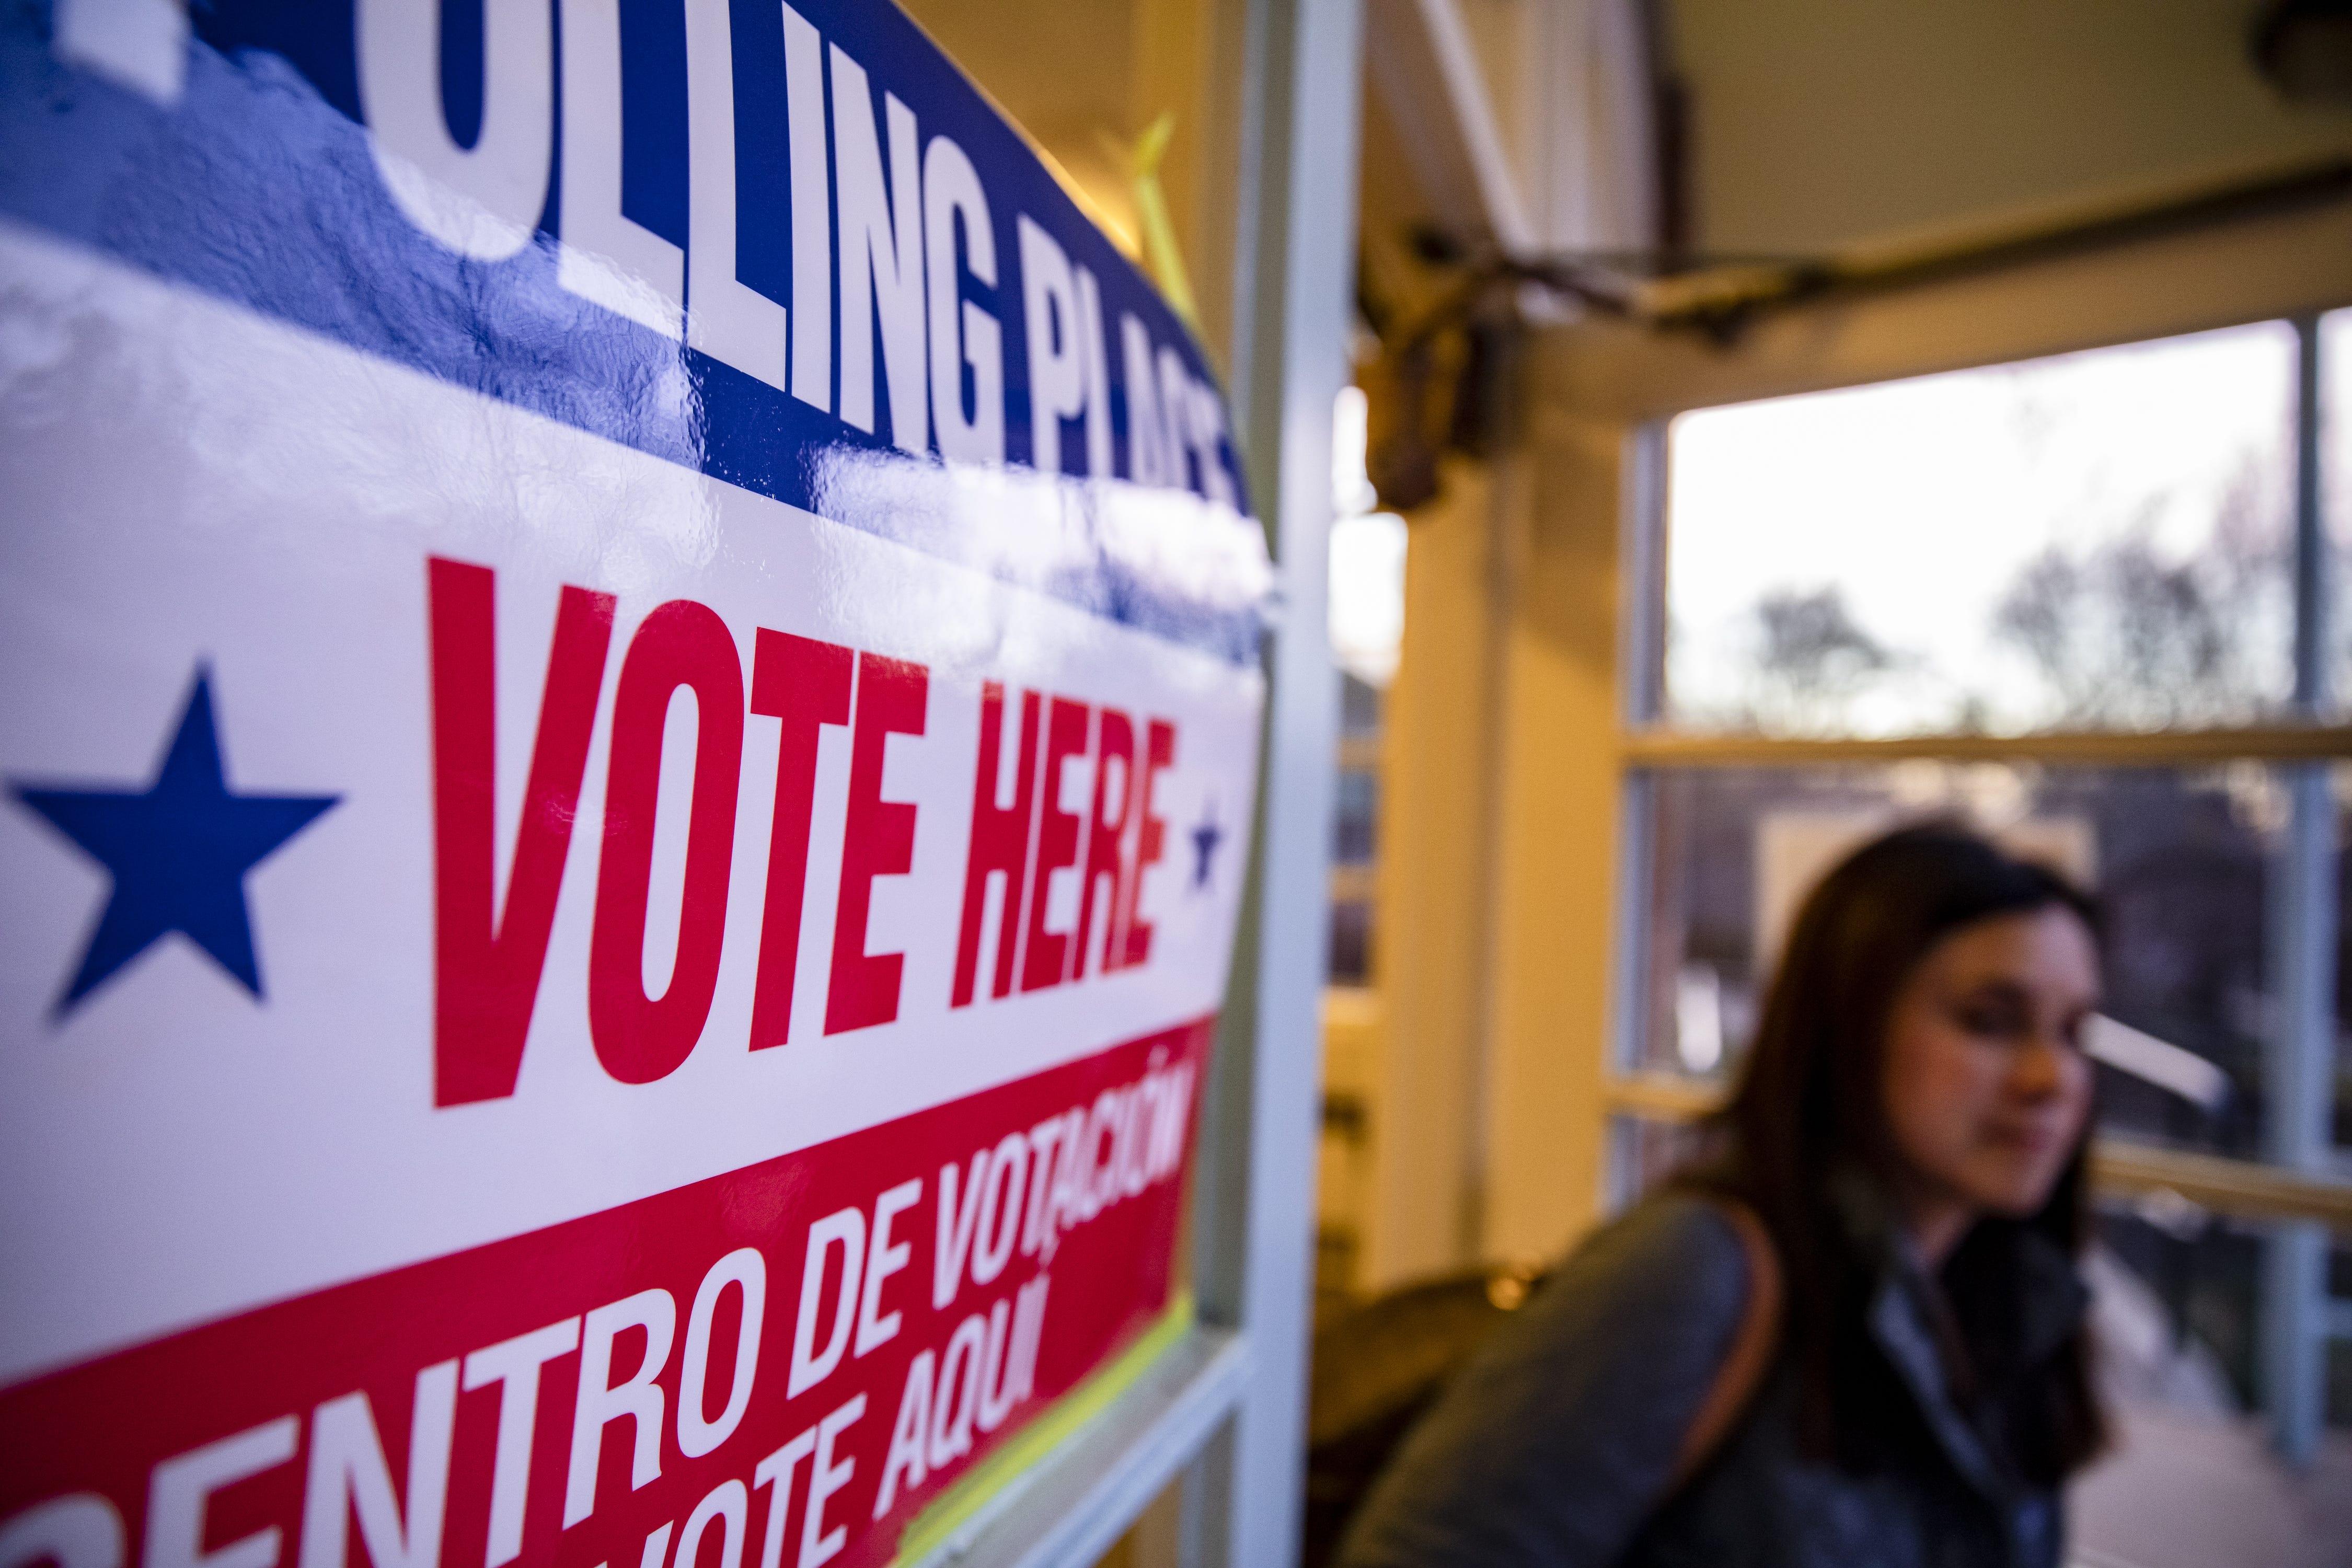 USA Vice President Joe Biden Democrat Politics Election Vote POSTER